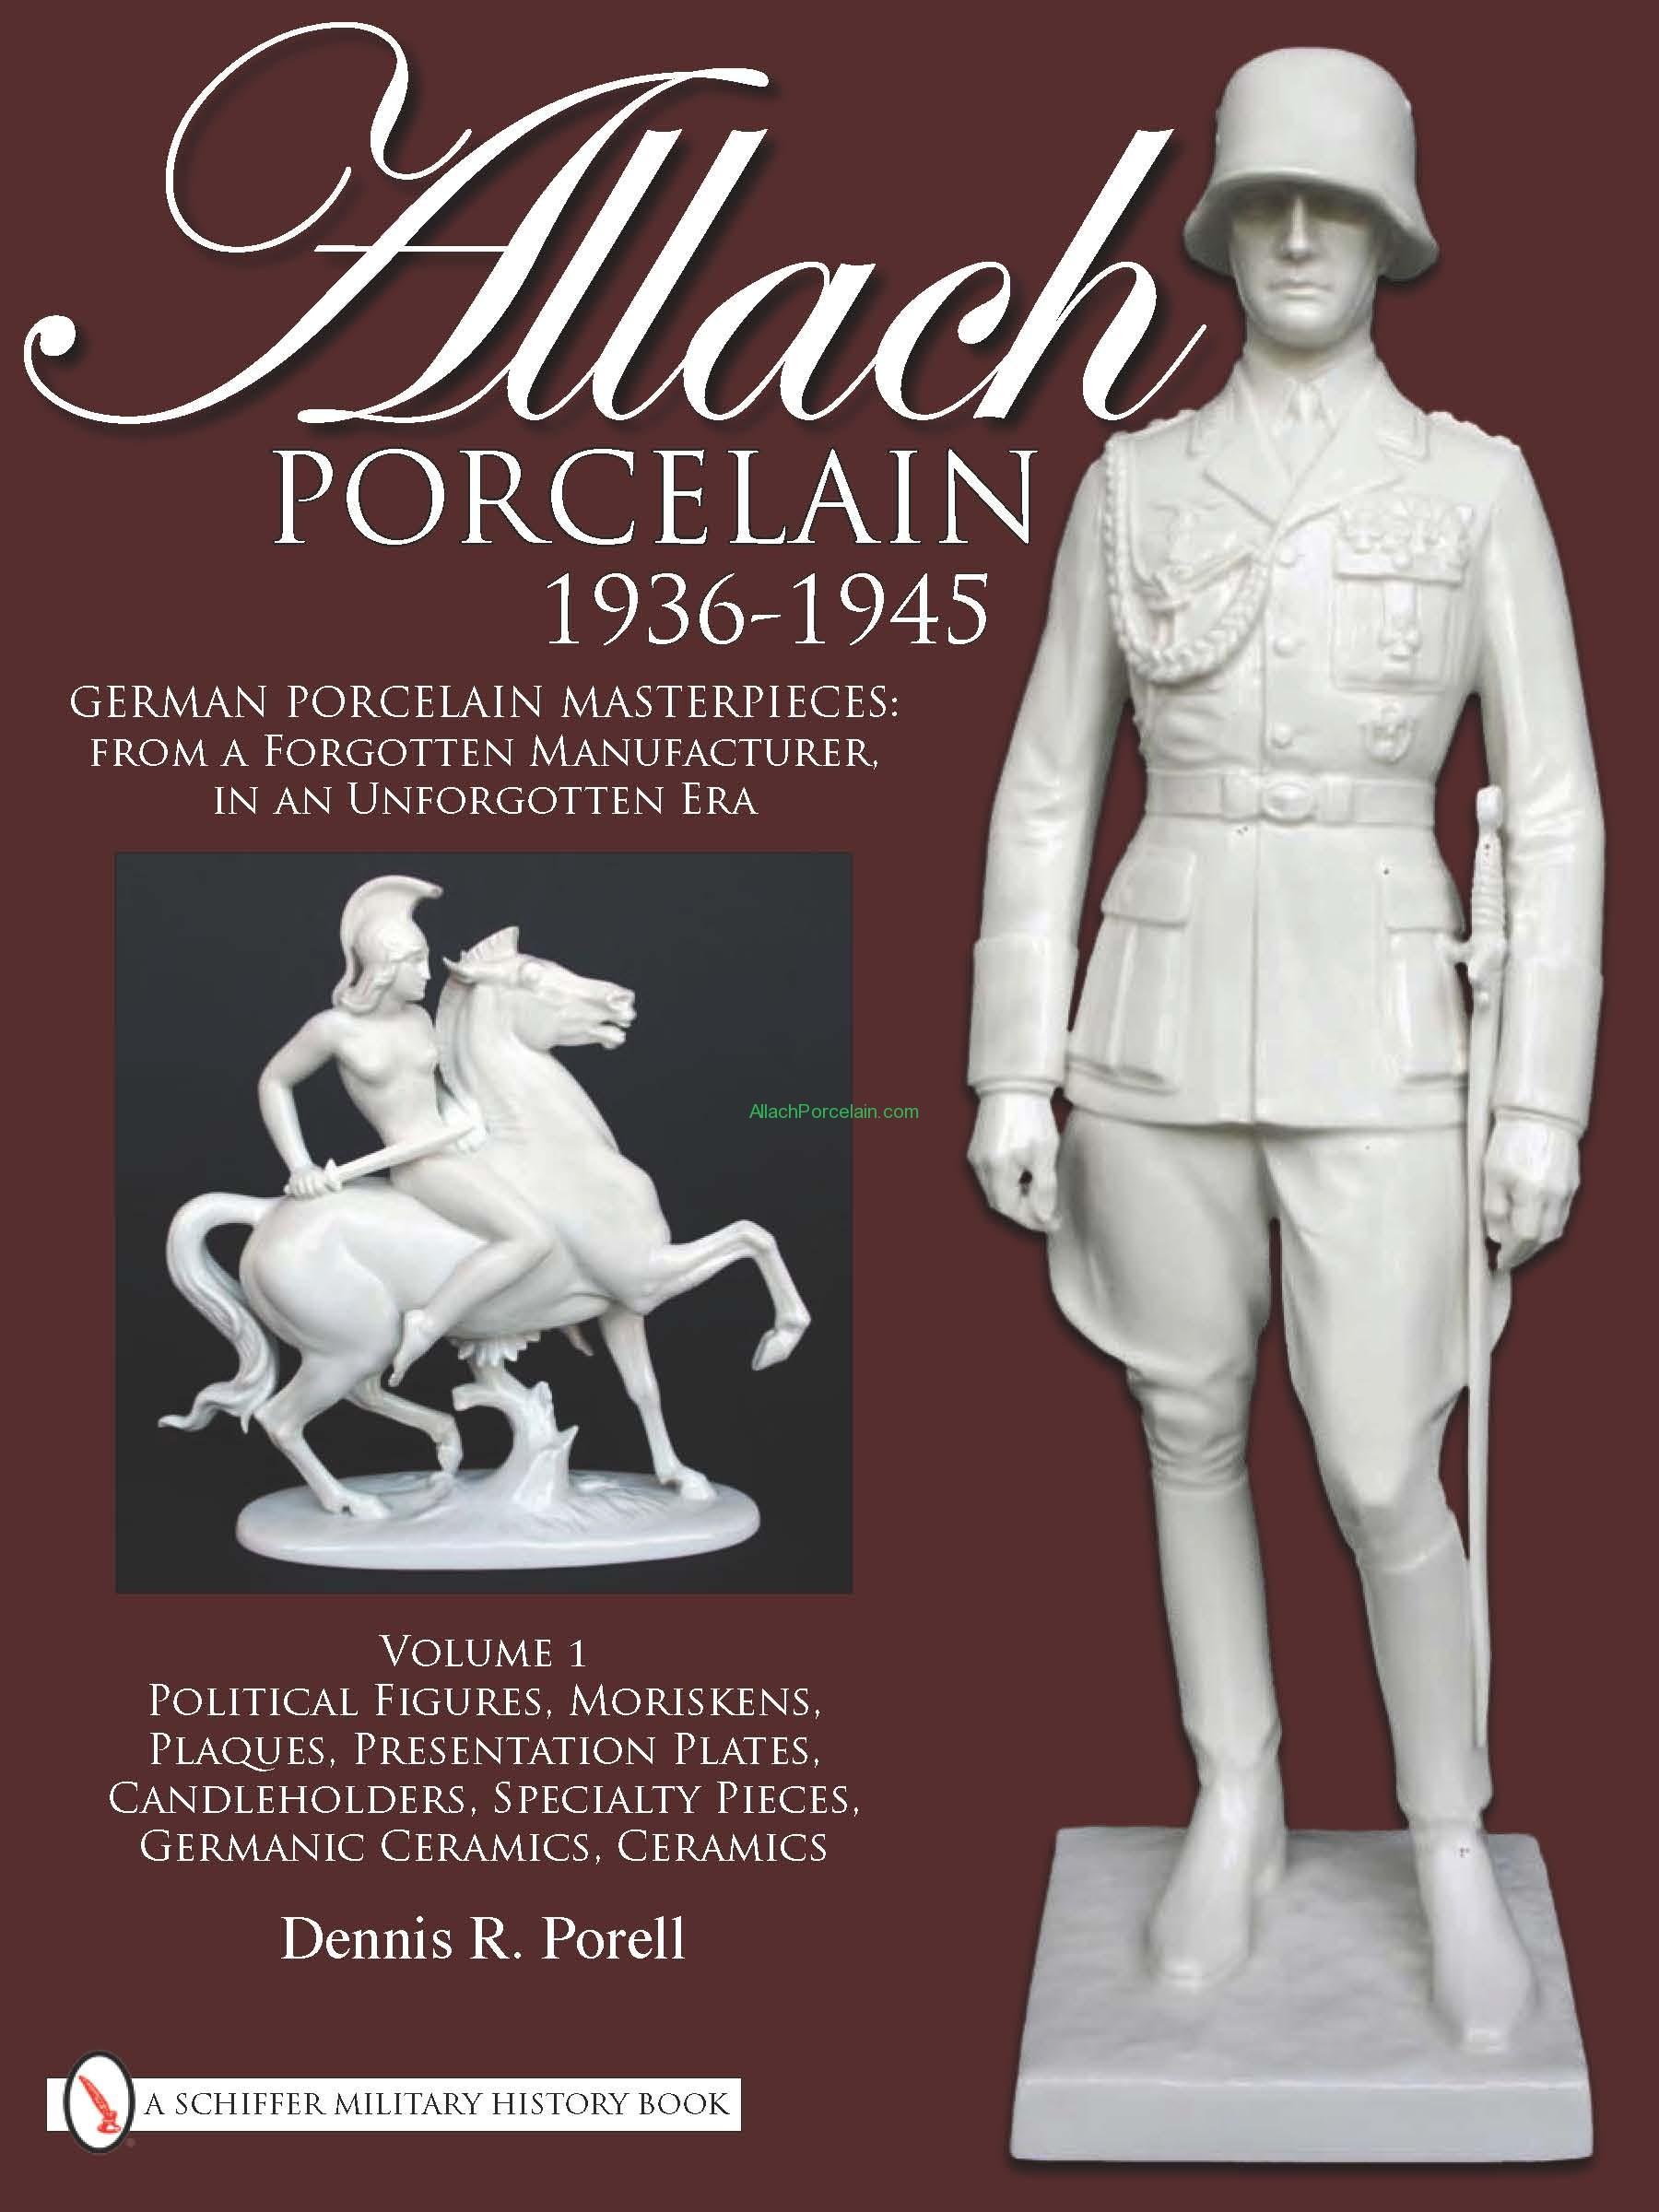 Allach Porcelain Volume II